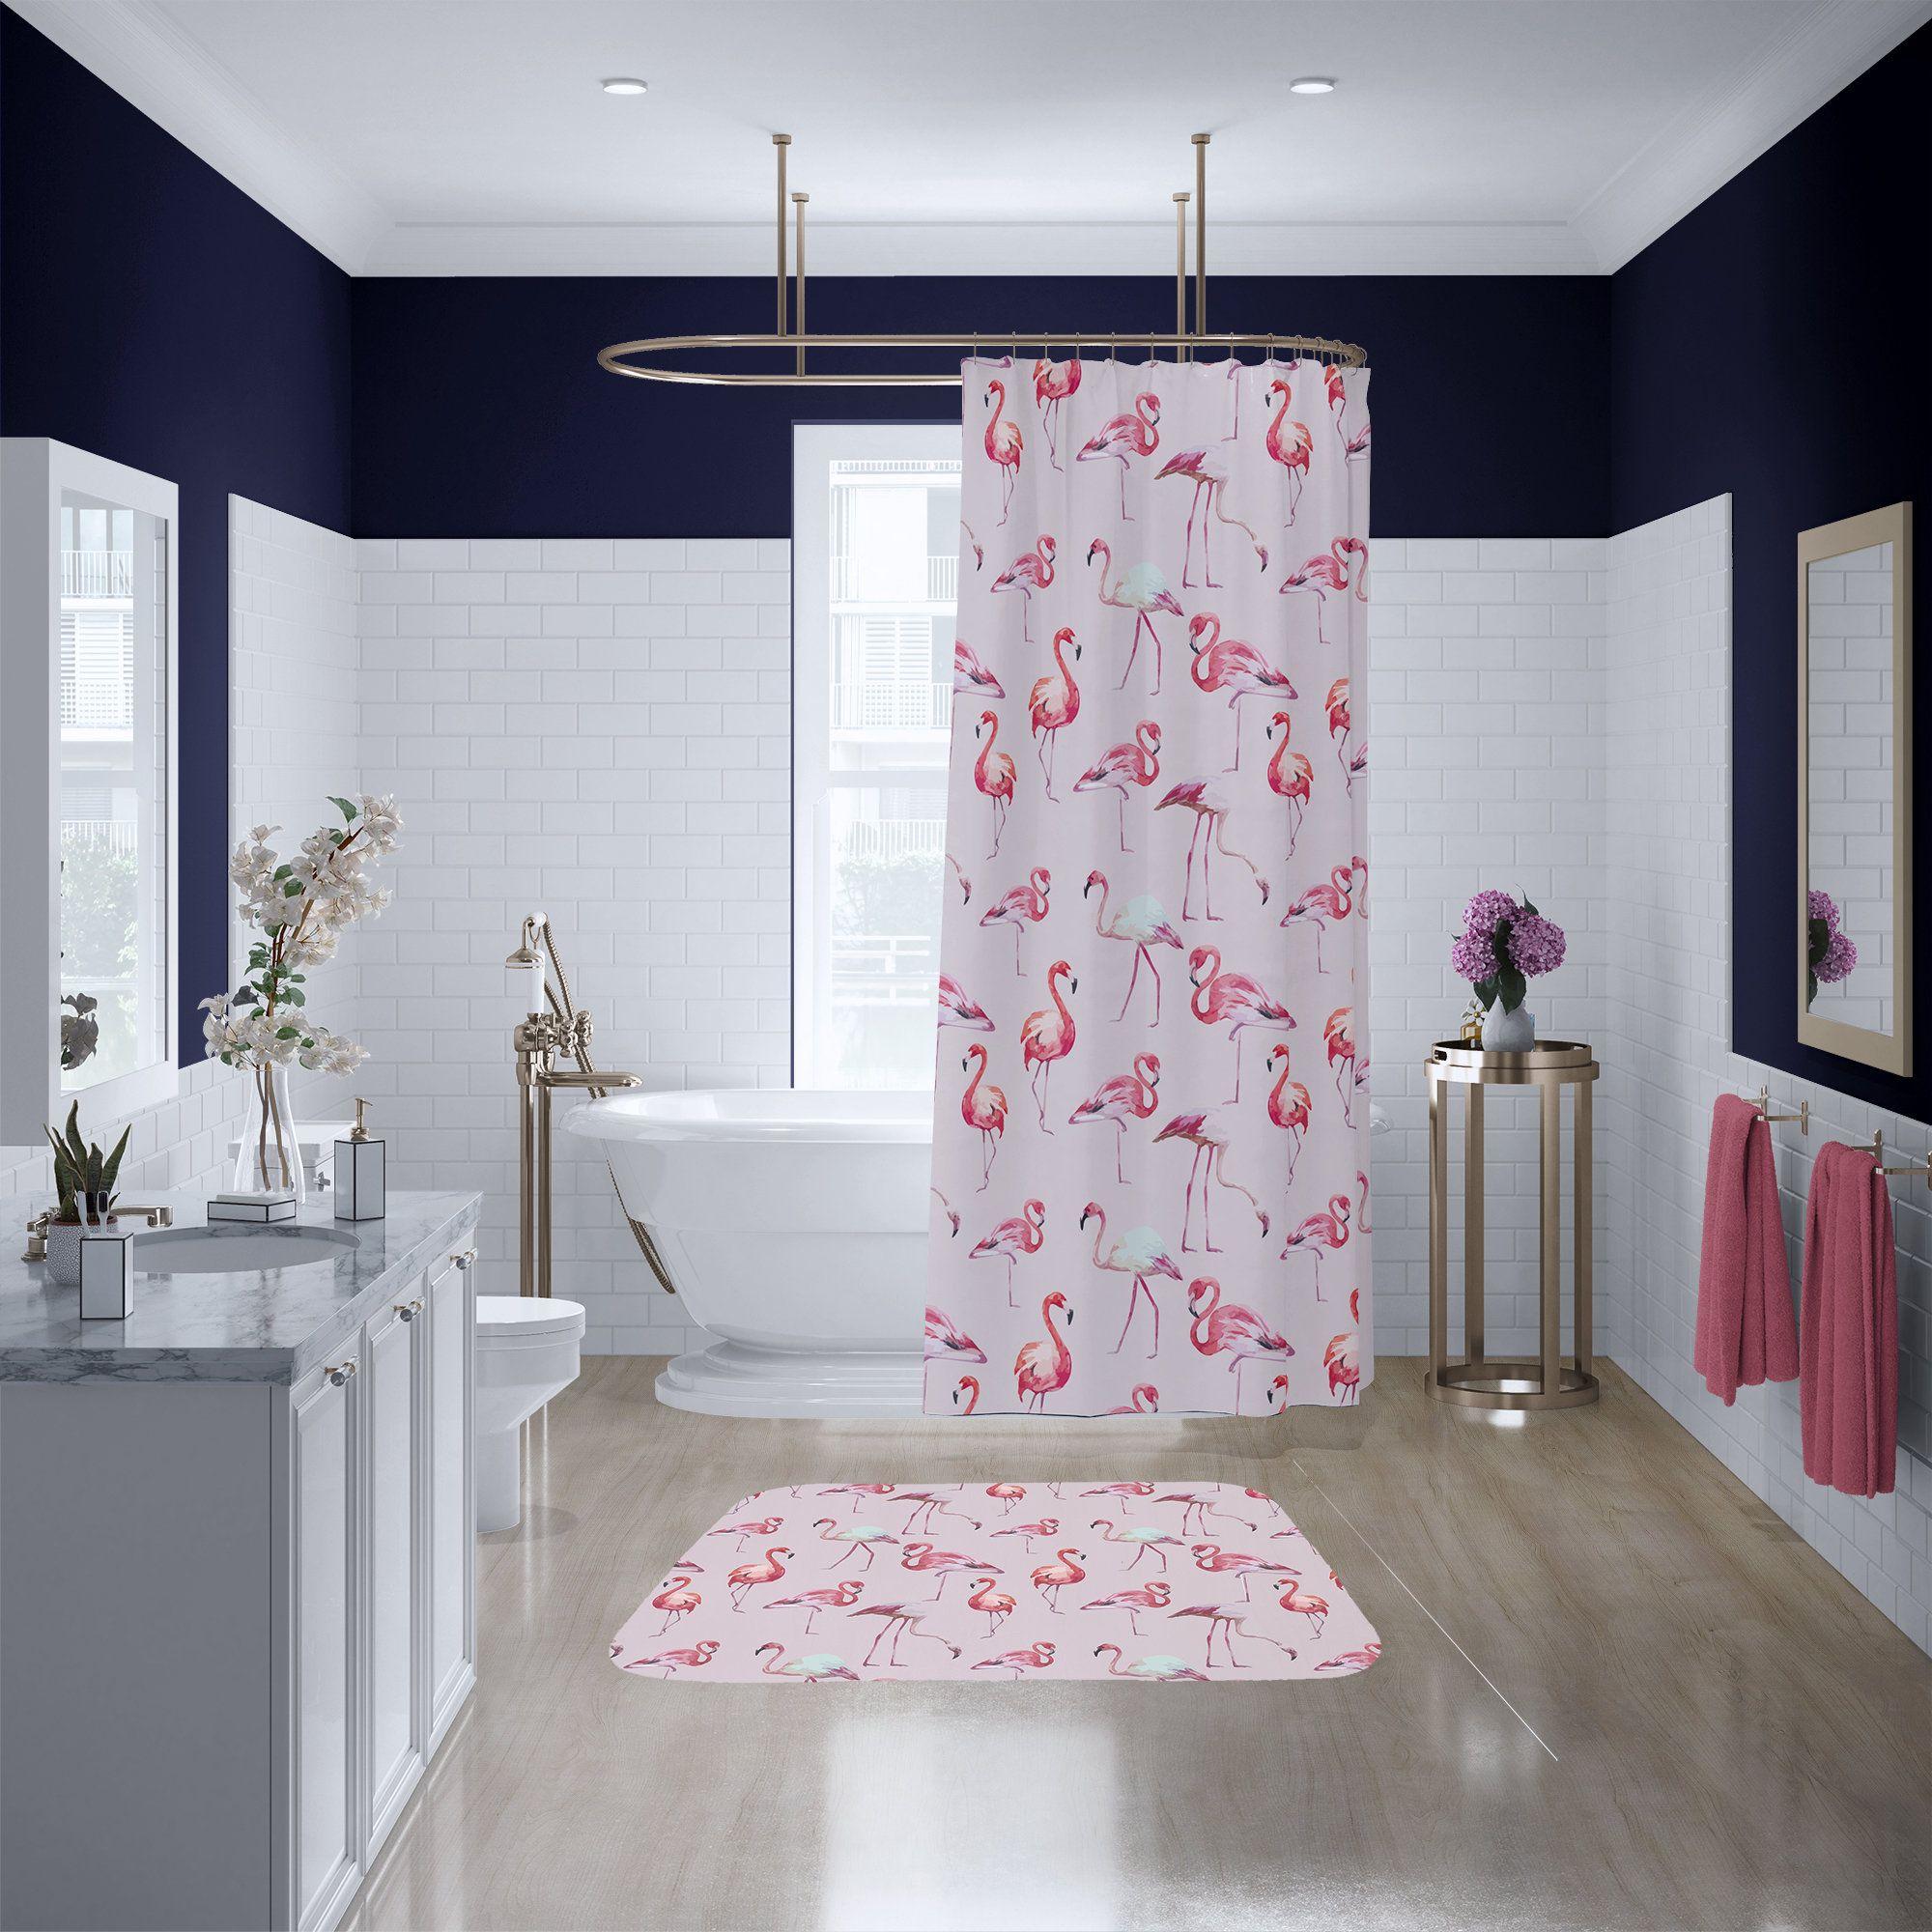 Pink Flamingo Pattern Shower Curtain Custom Printed Bath Curtain